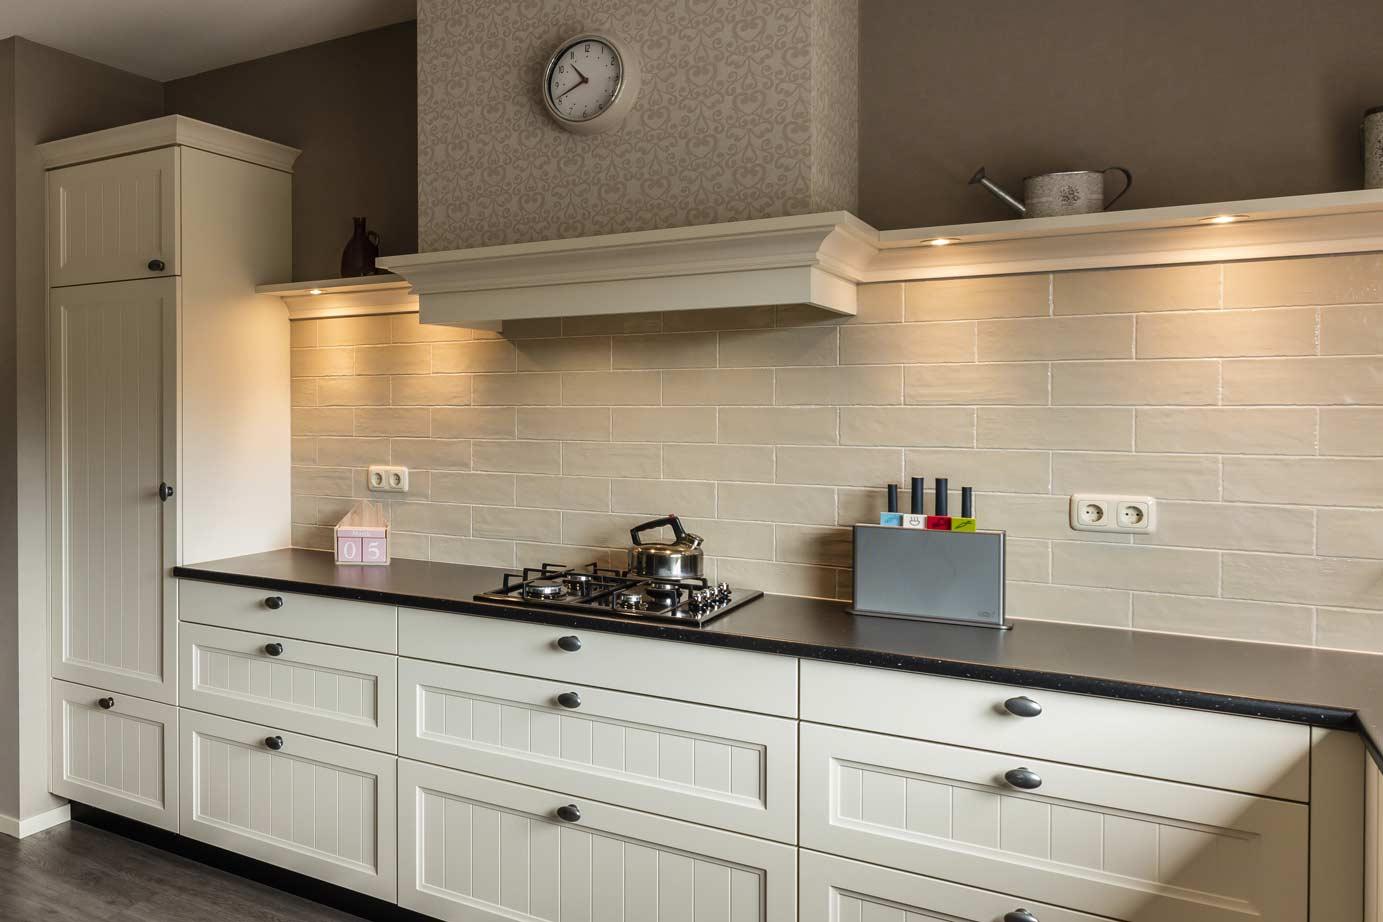 Keur Keukens Keukentegels : Tegels voor de keuken en badkamer eigen montage db keukens